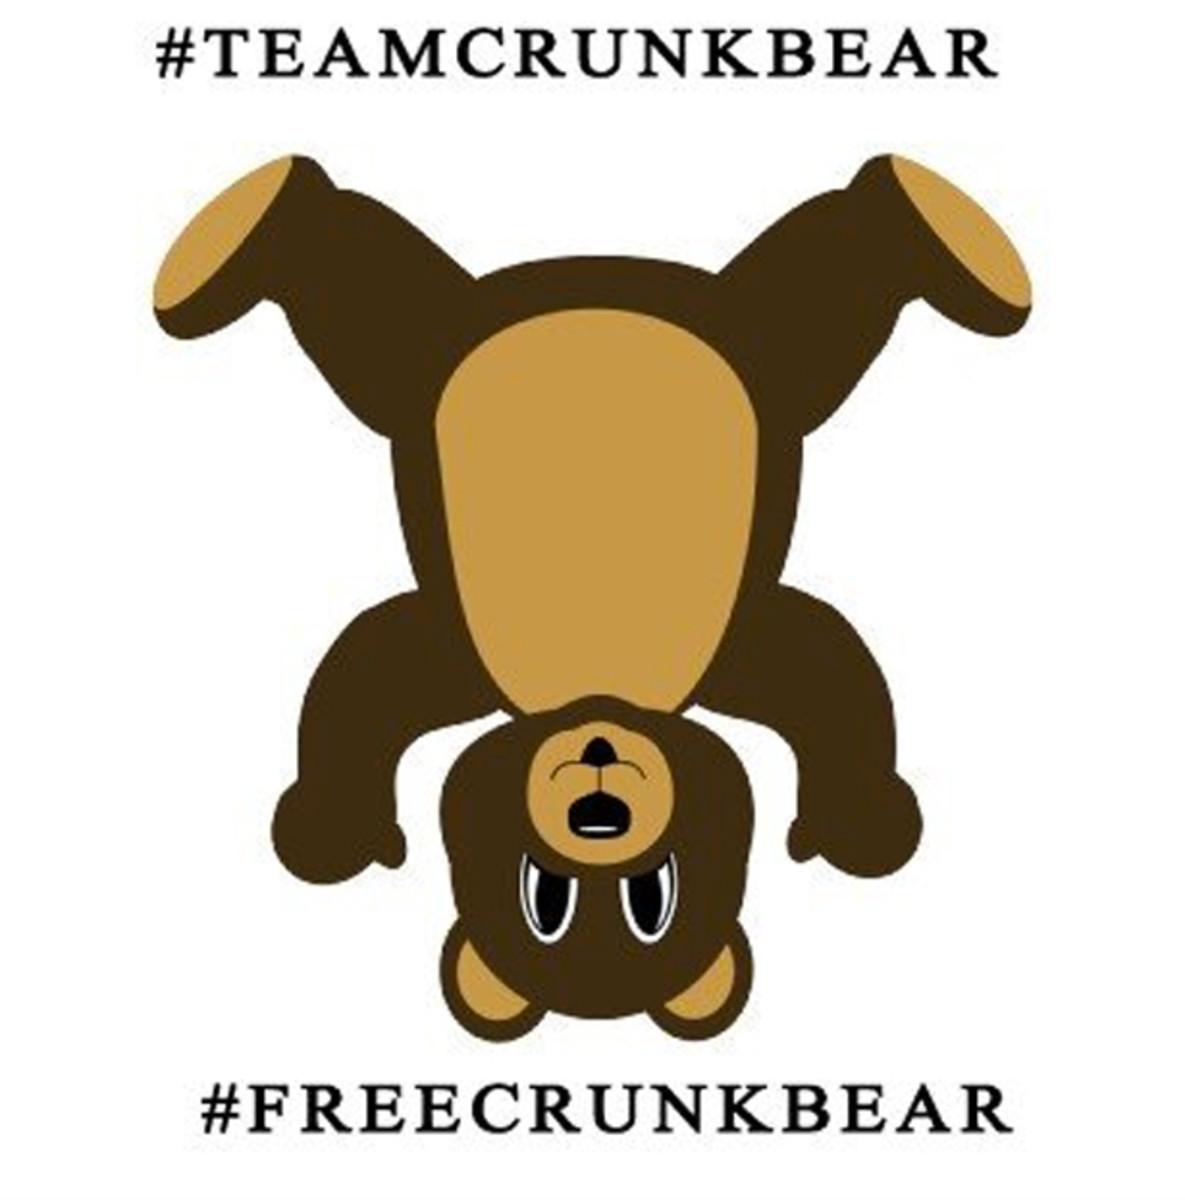 FreeCrunkbear